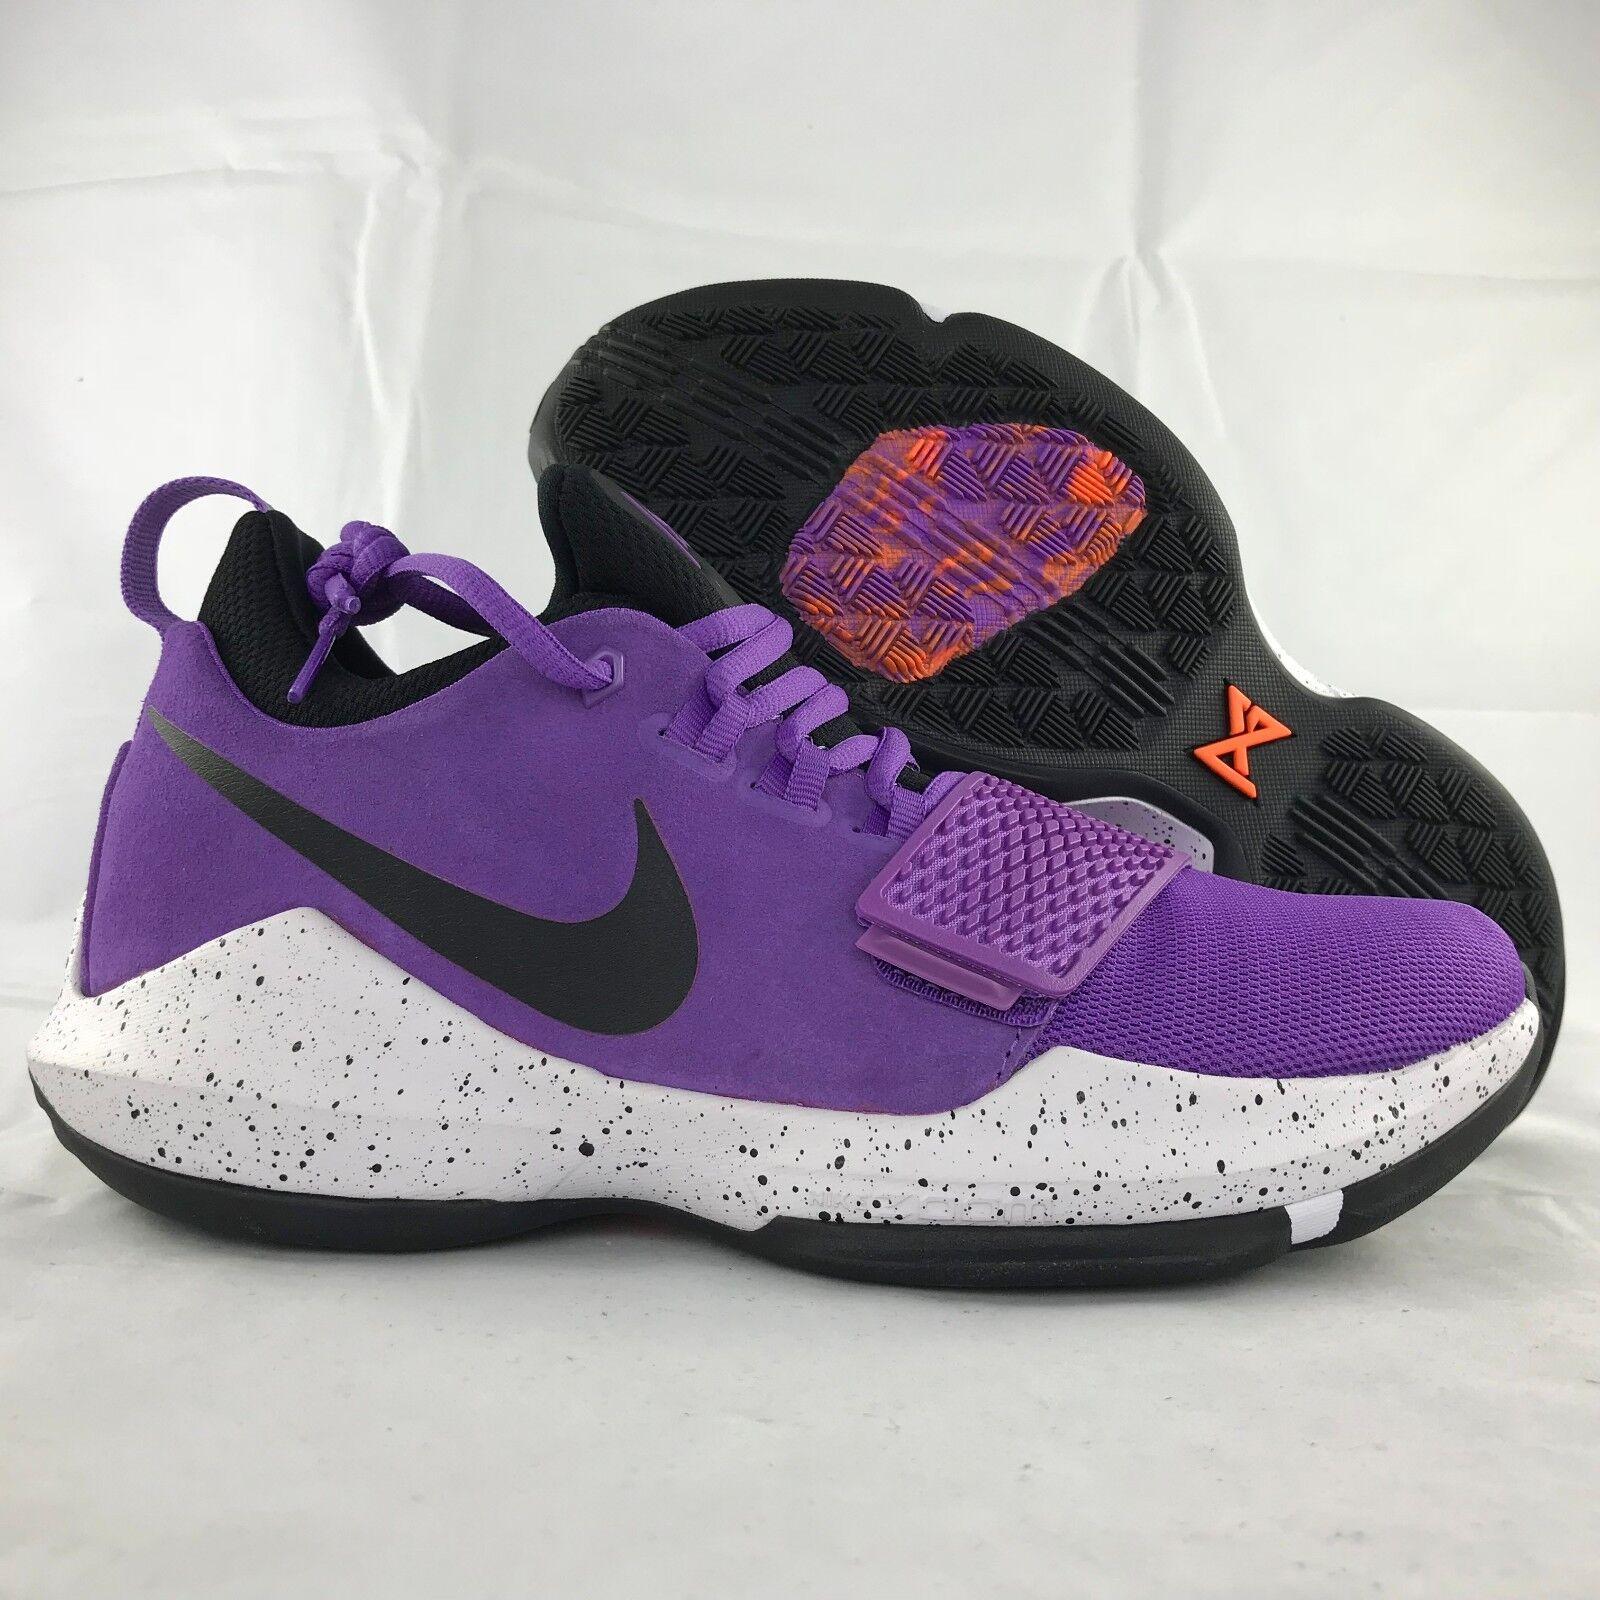 Nike pg 1 brillante violet purple bianco nero paul george 878627-500 Uomo 10 - 12 nuovi